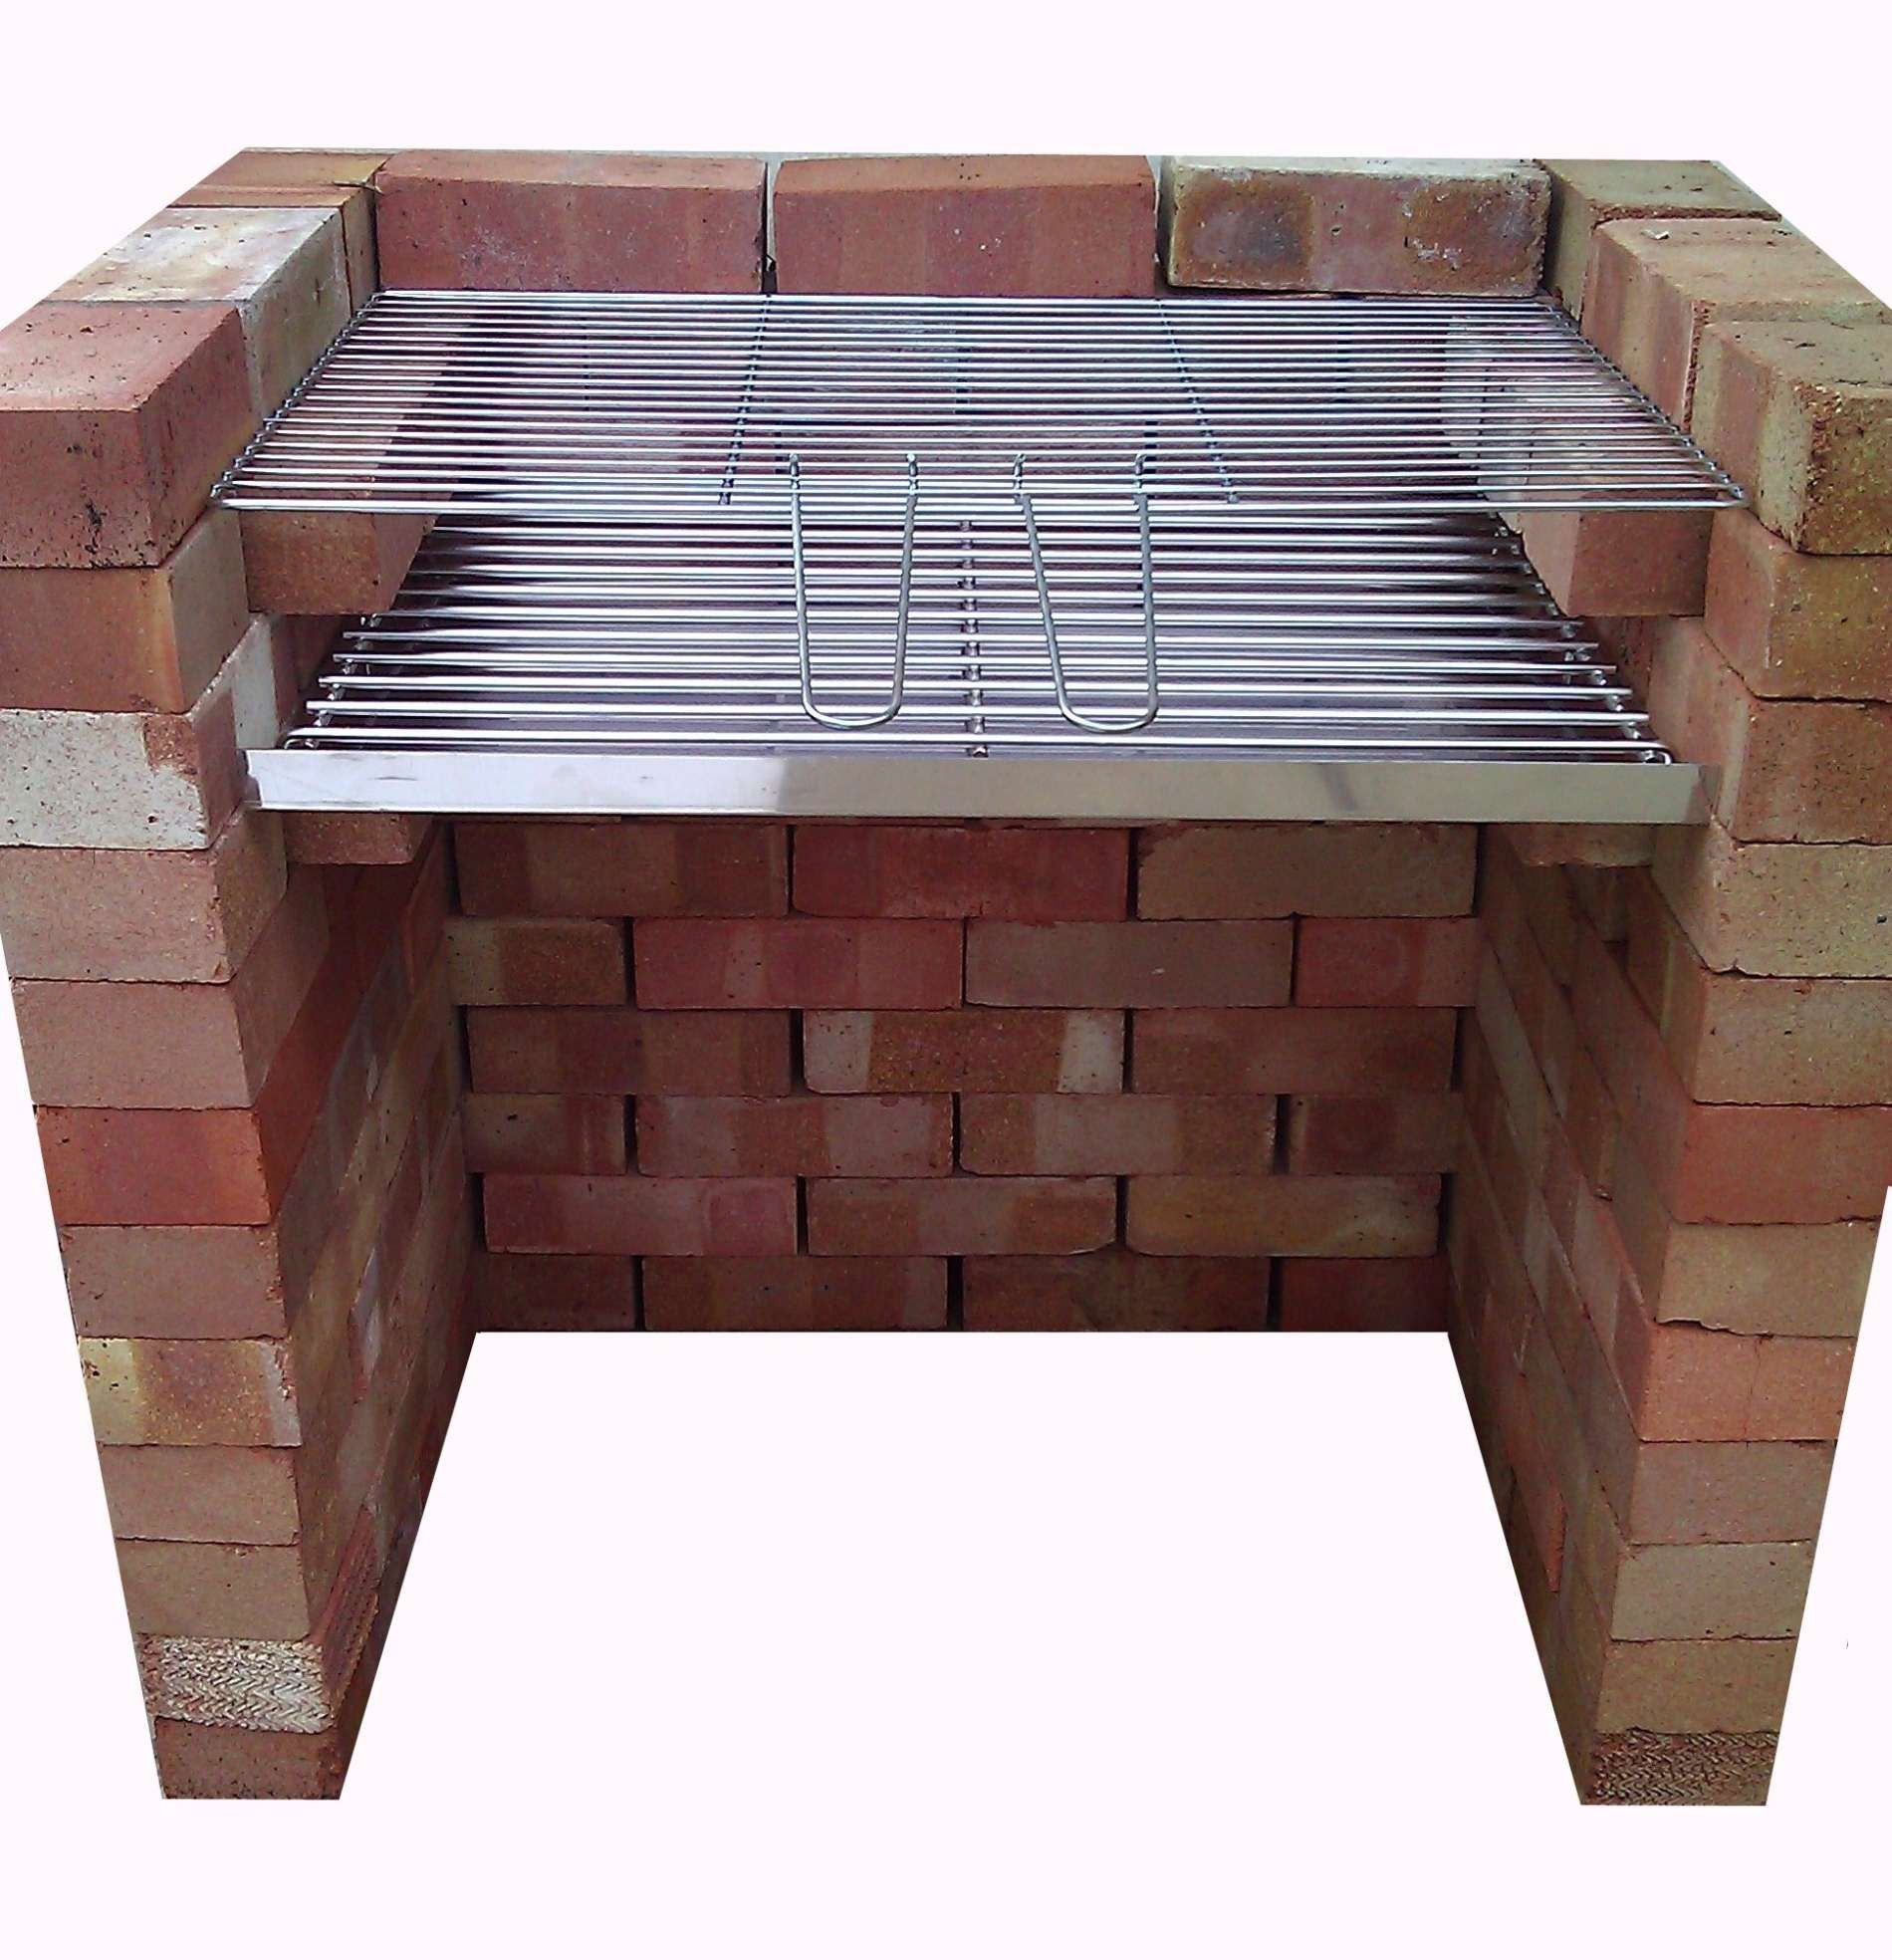 how to build a brick bbq smoker